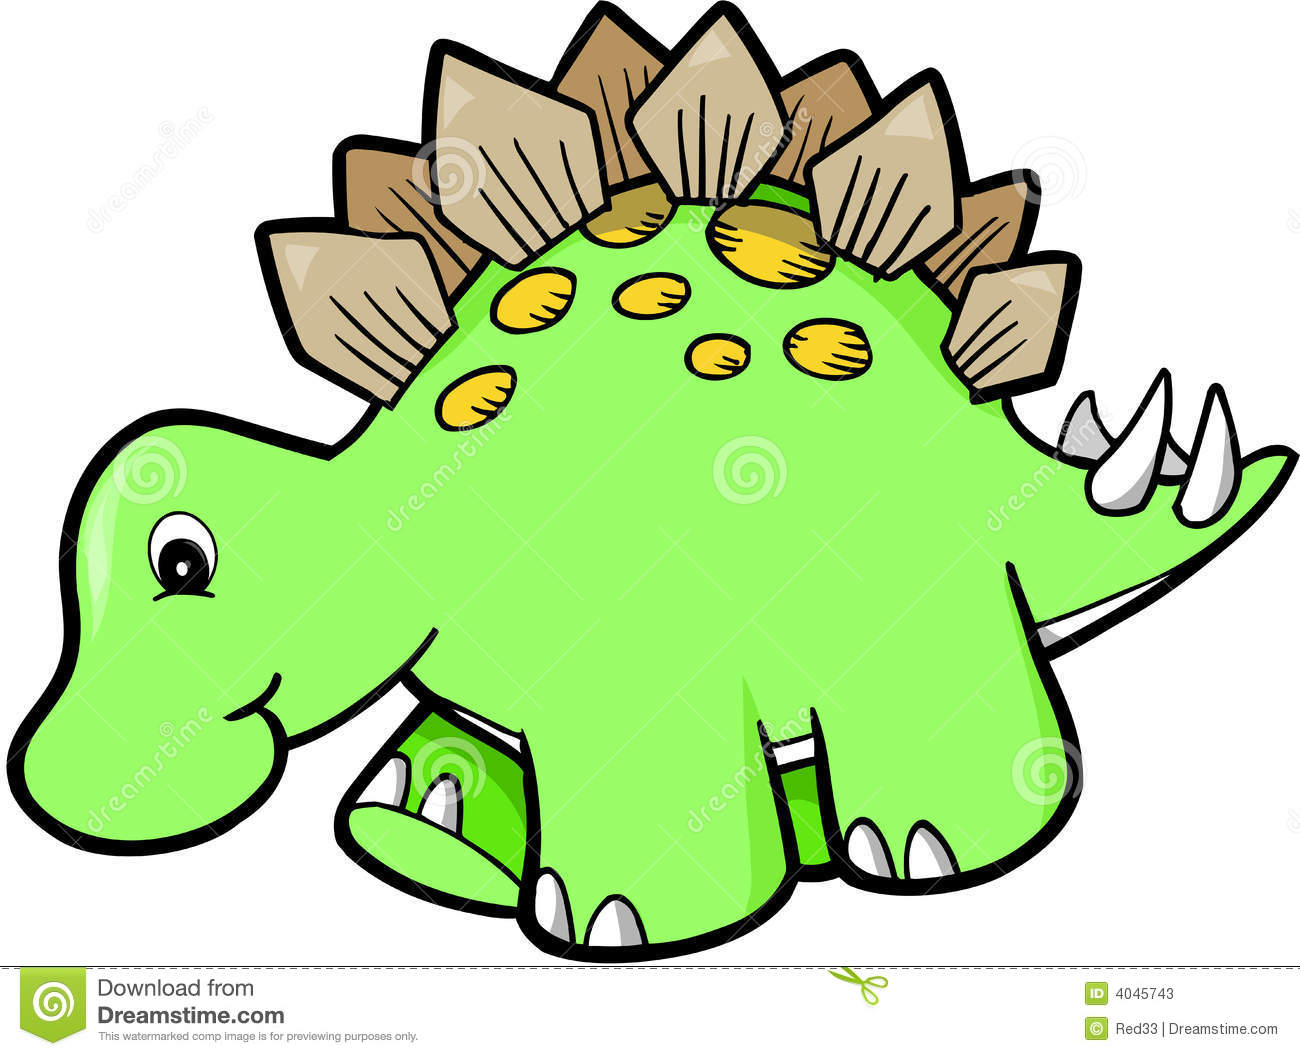 cute dinosaur clipart panda free clipart images rh clipartpanda com free cute dinosaur clipart free cute dinosaur clipart